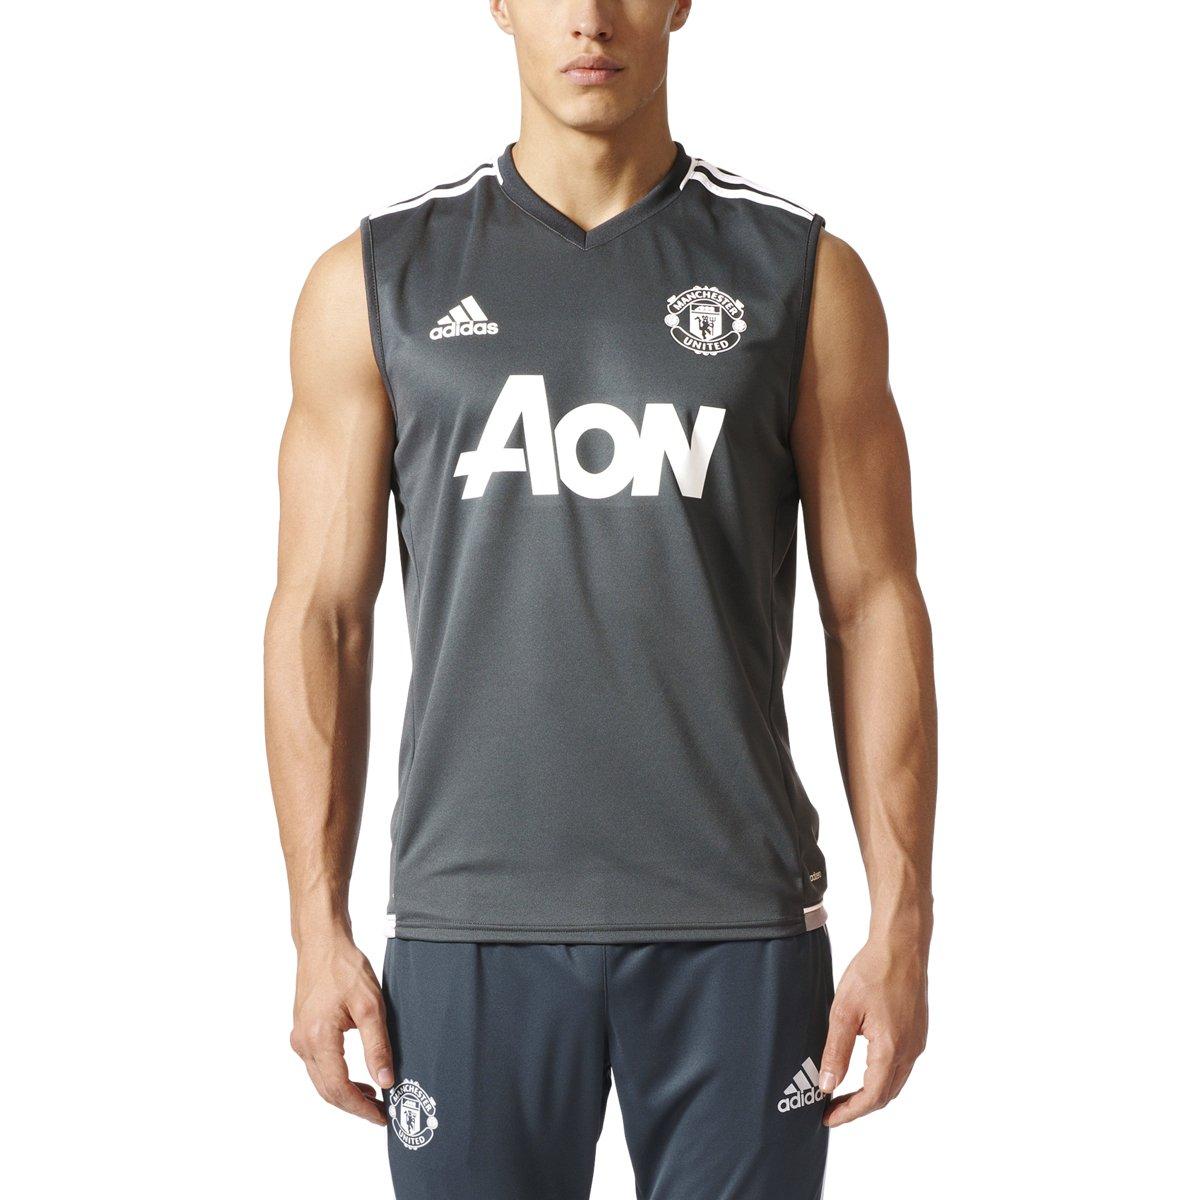 721f86fa5 adidas Men s Manchester United Sleeveless Training Jersey (Small) Grey   Amazon.ca  Clothing   Accessories